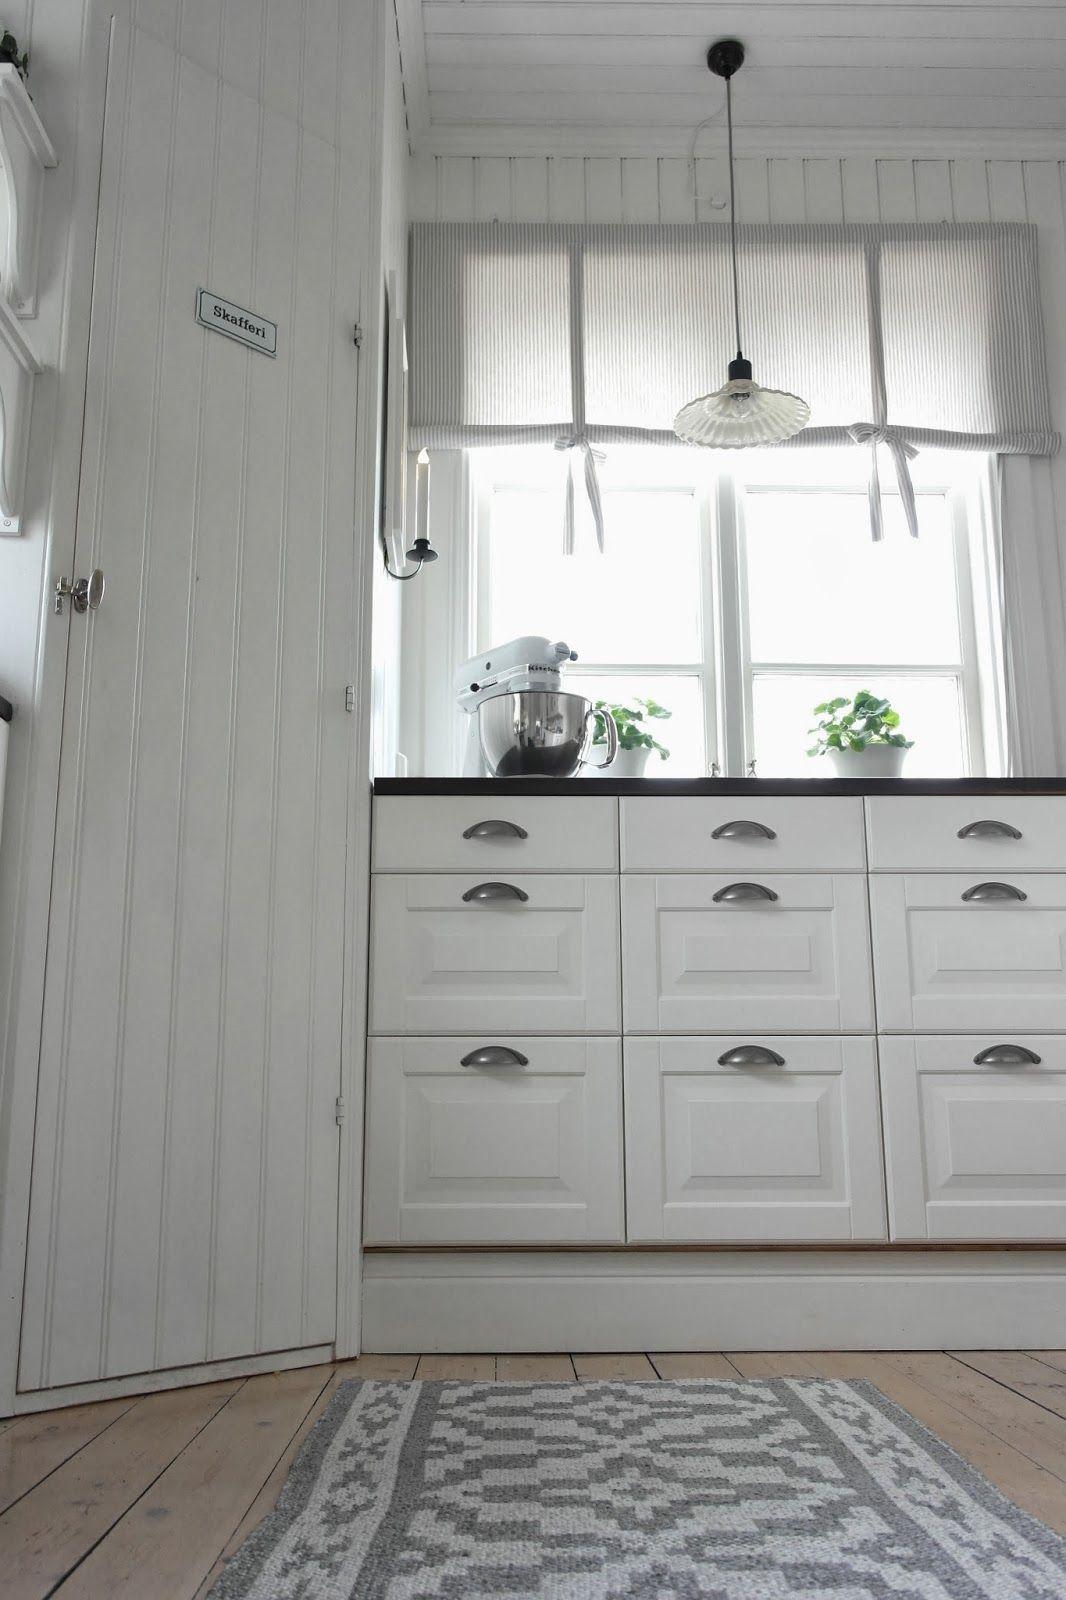 vitt hus med vita knutar | Kök | Pinterest | Küche